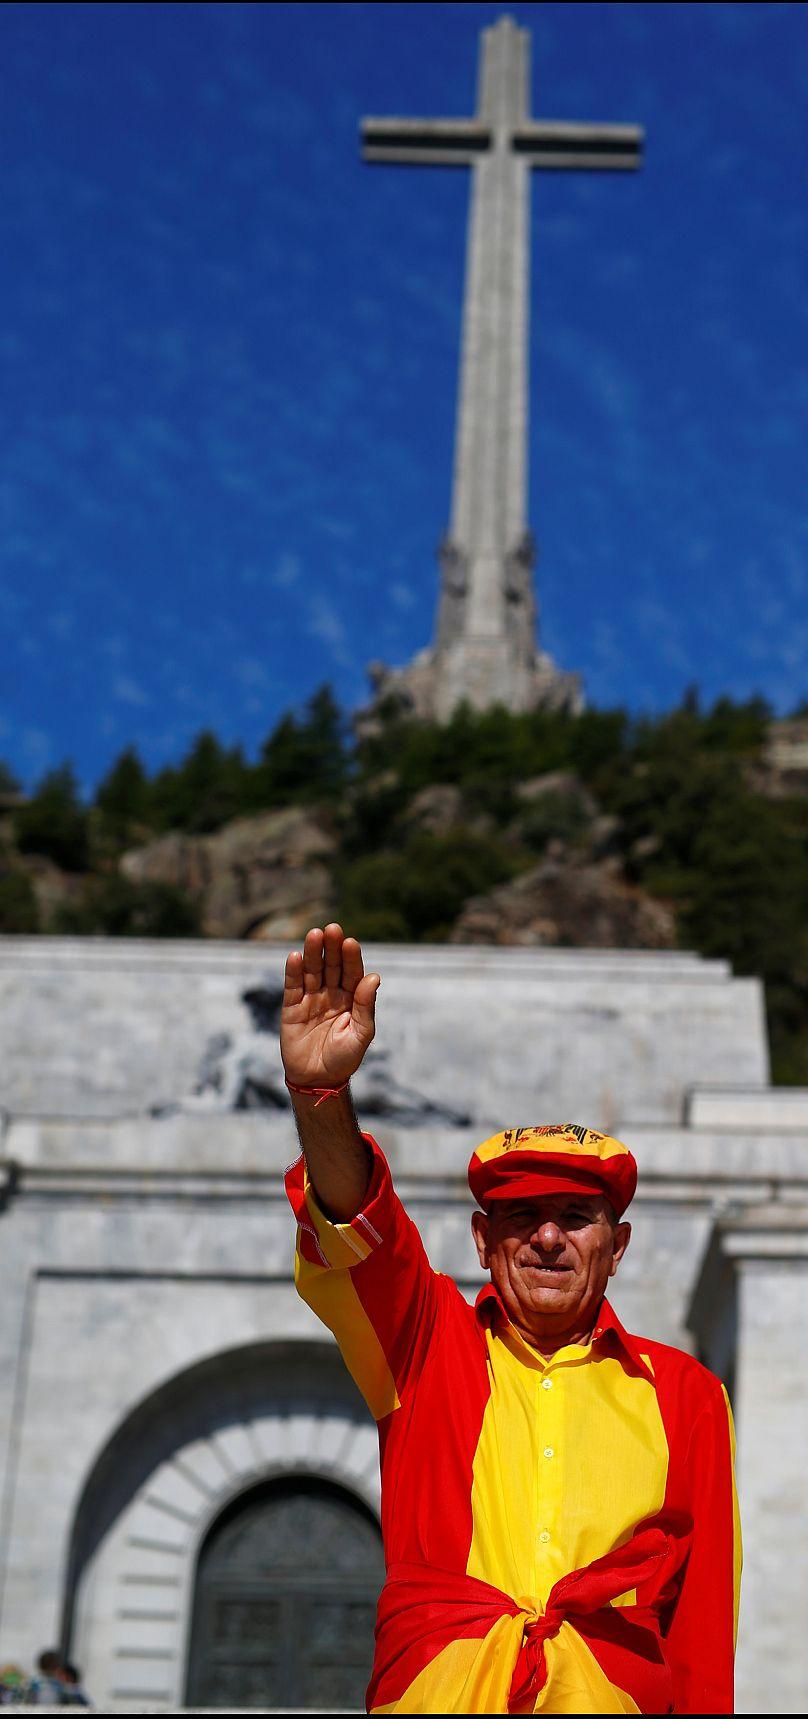 REUTERS/Javier Barbancho